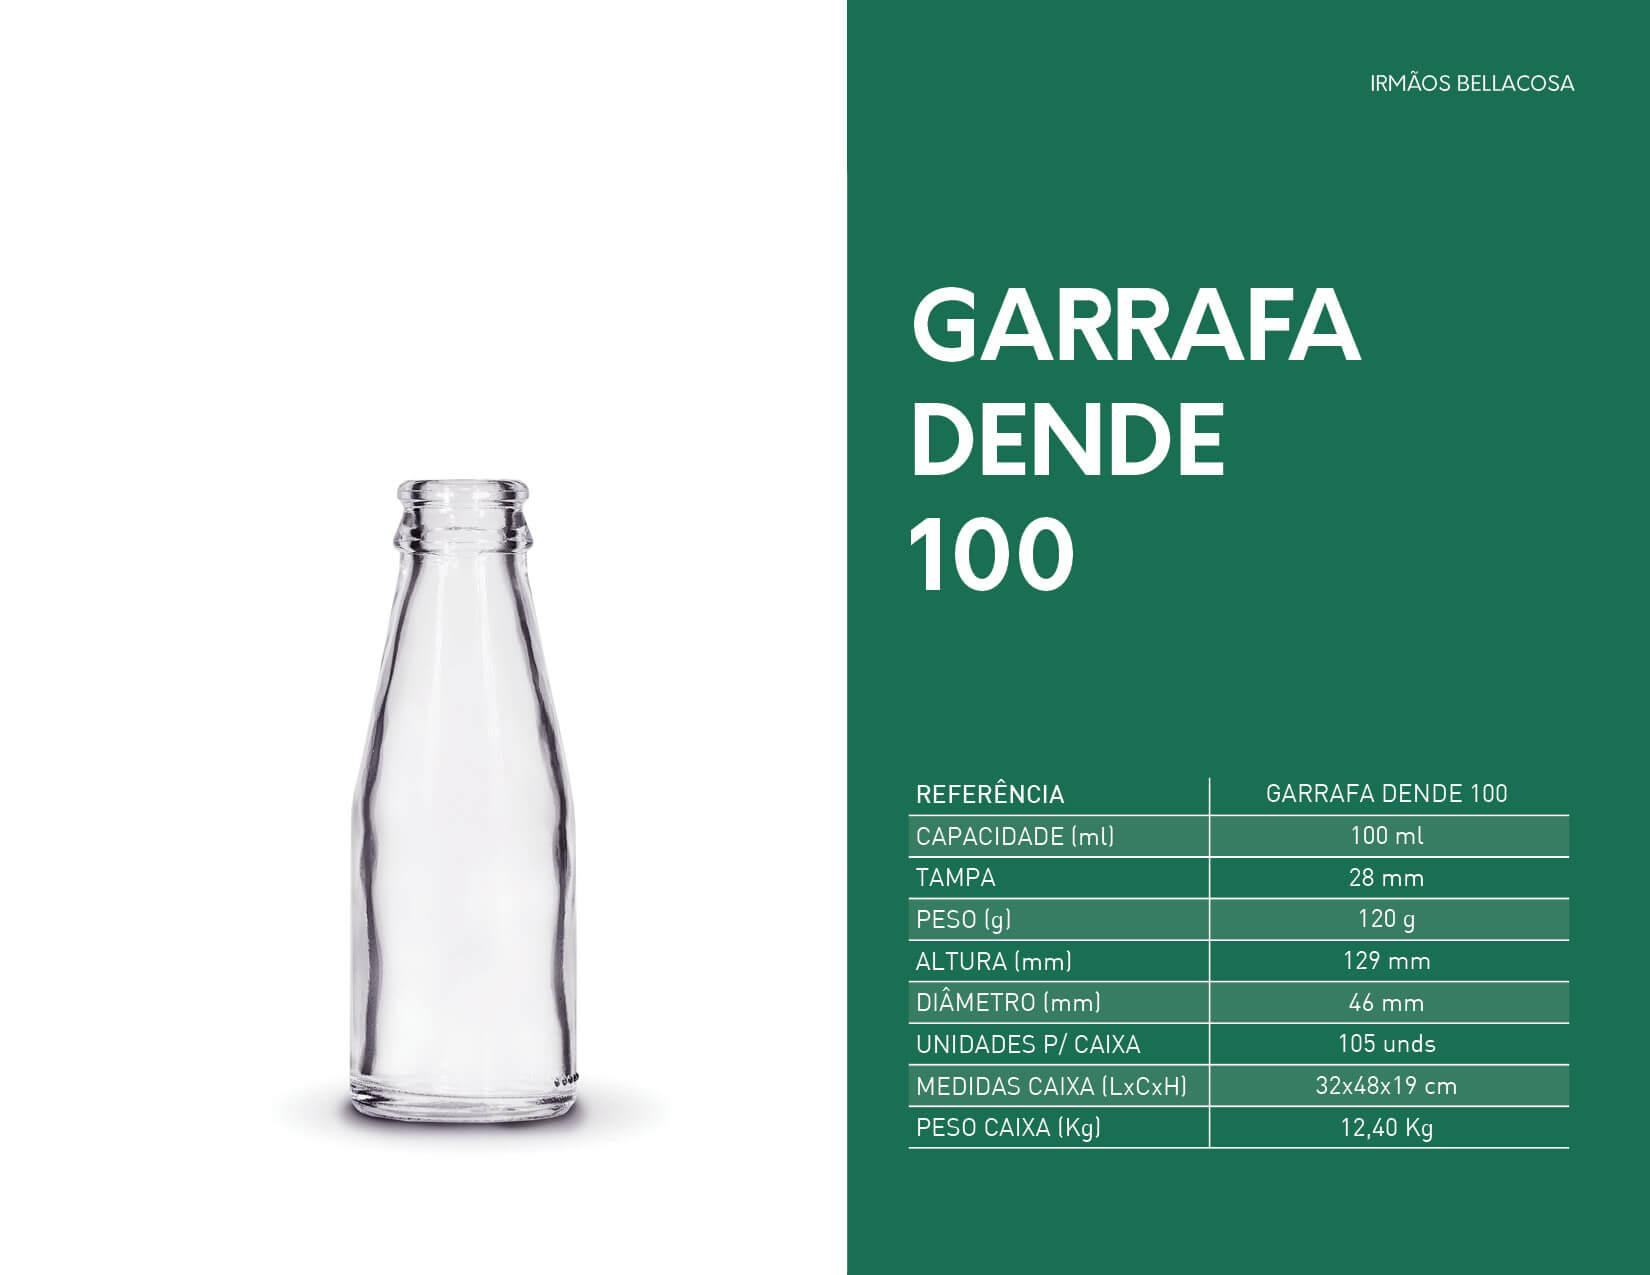 039-Garrafa-dende-100-irmaos-bellacosa-embalagens-de-vidro